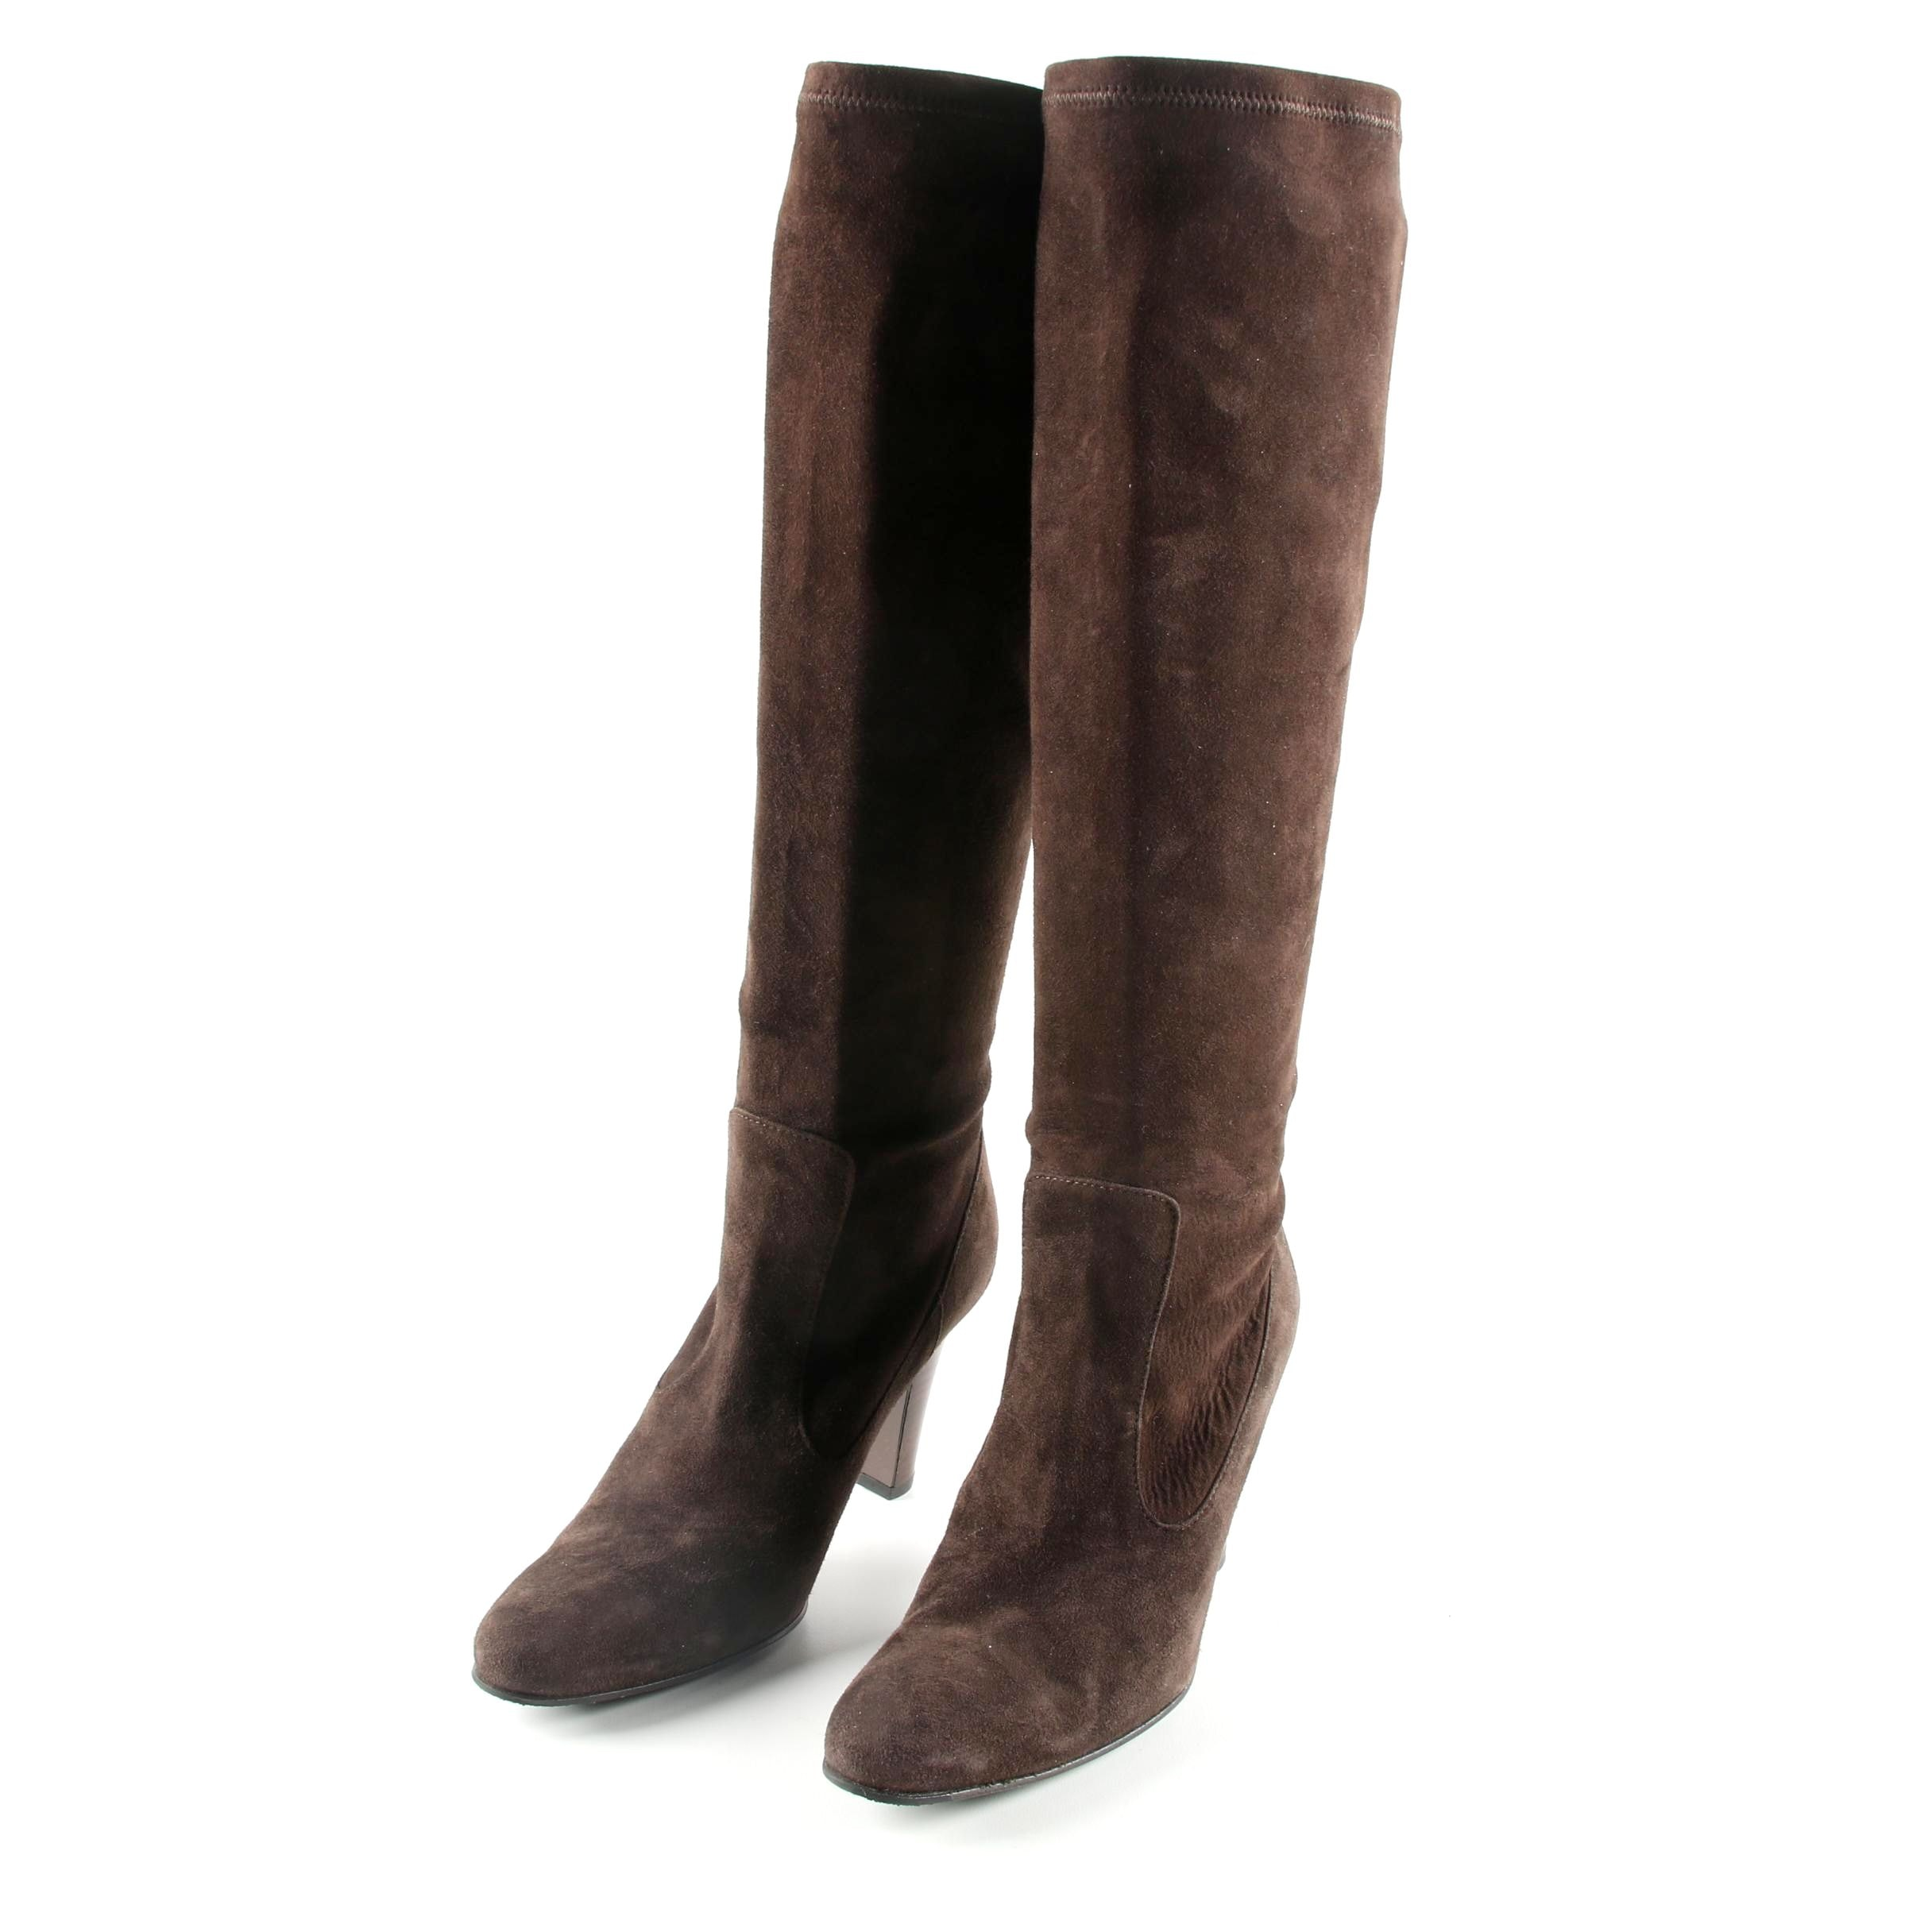 Cole Haan Brown Suede Knee-High Boots